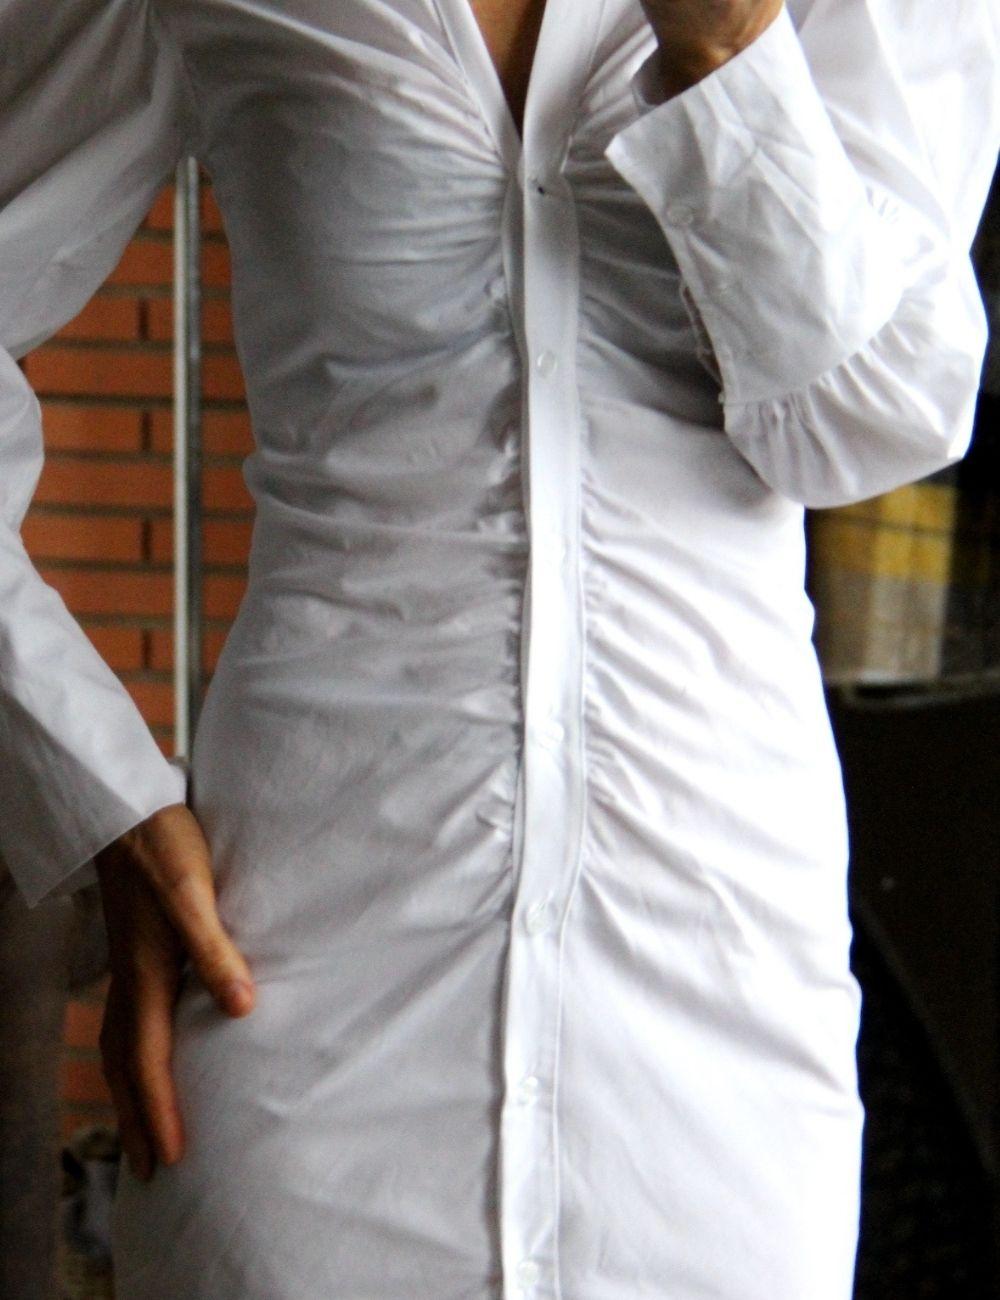 Robe Chemise Pas Cher Chemise Blanche Cintree Laisse Les Parler